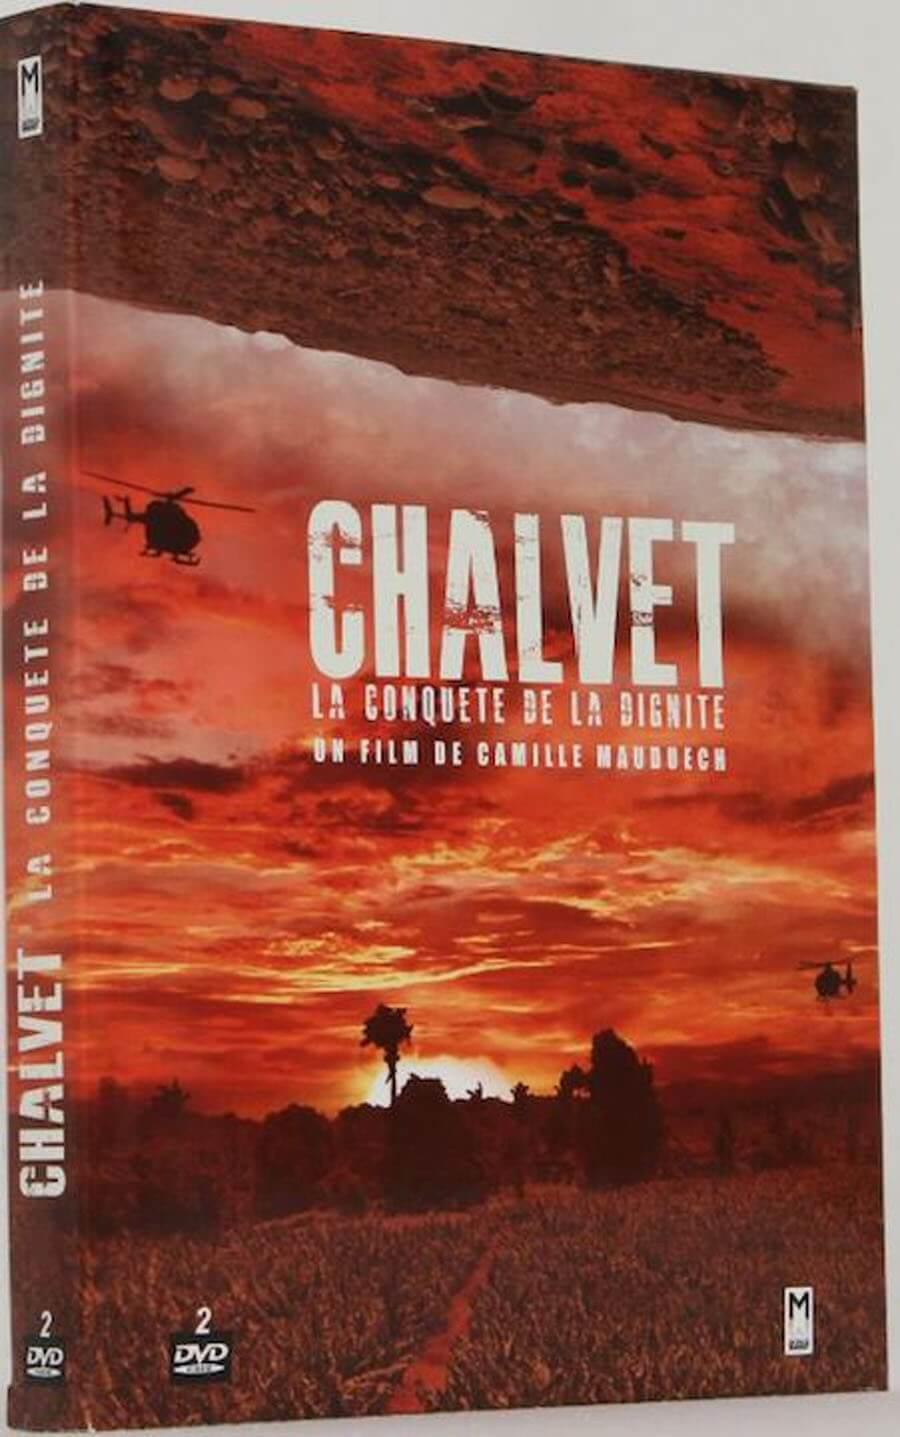 CHALVET - LA CONQUETE DE LA DIGNITE